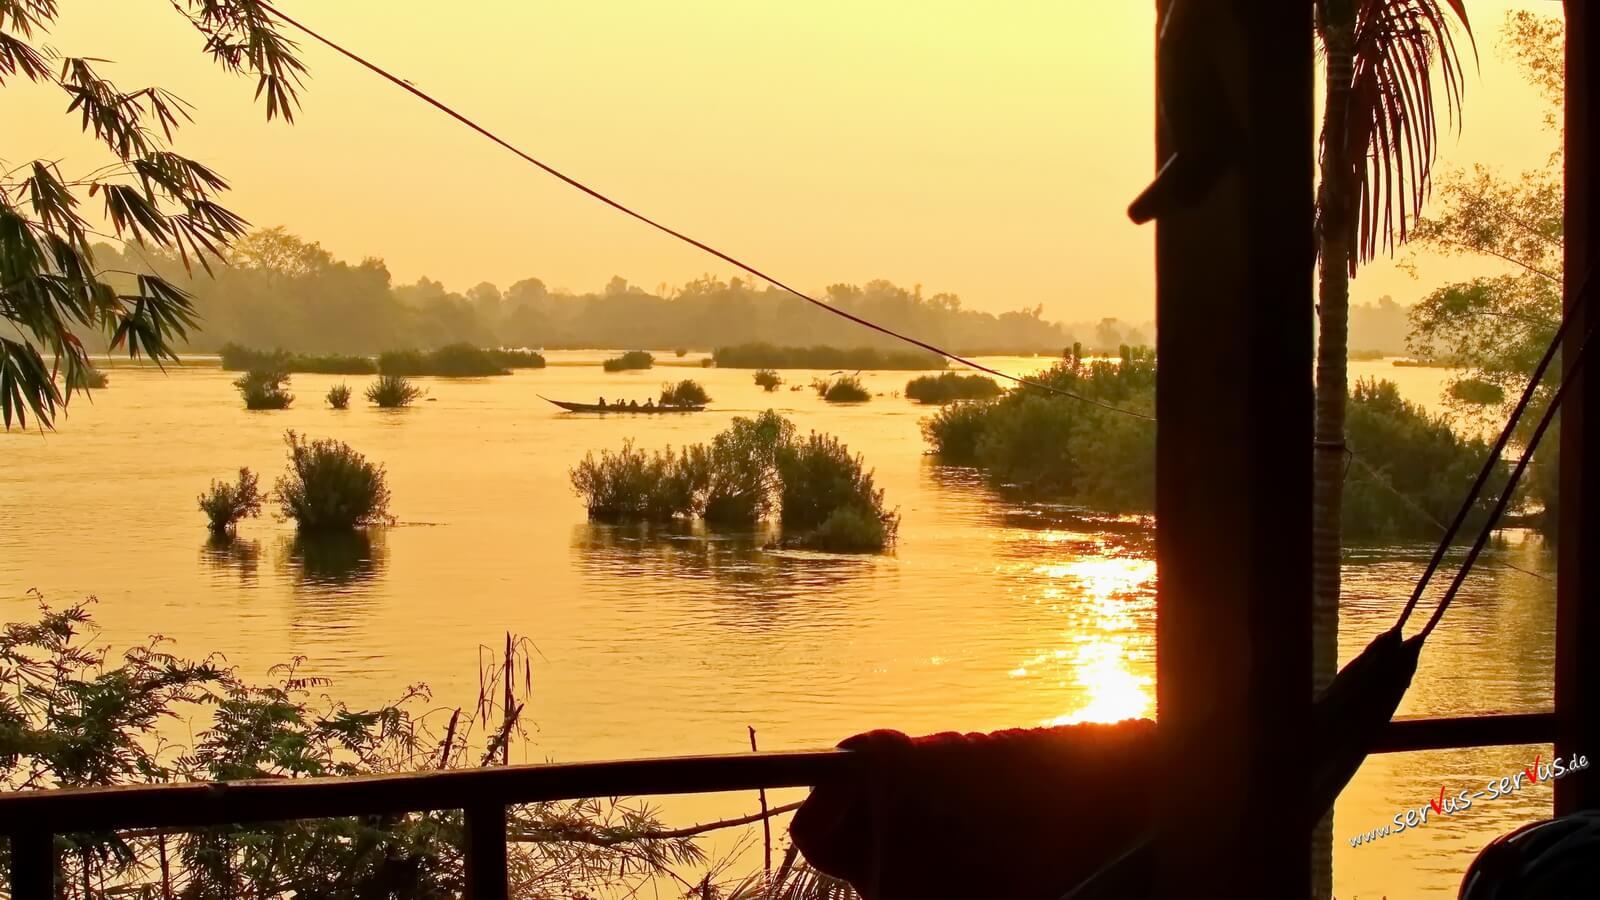 Sonnenaufgang, Mekong, Don Det, Laos